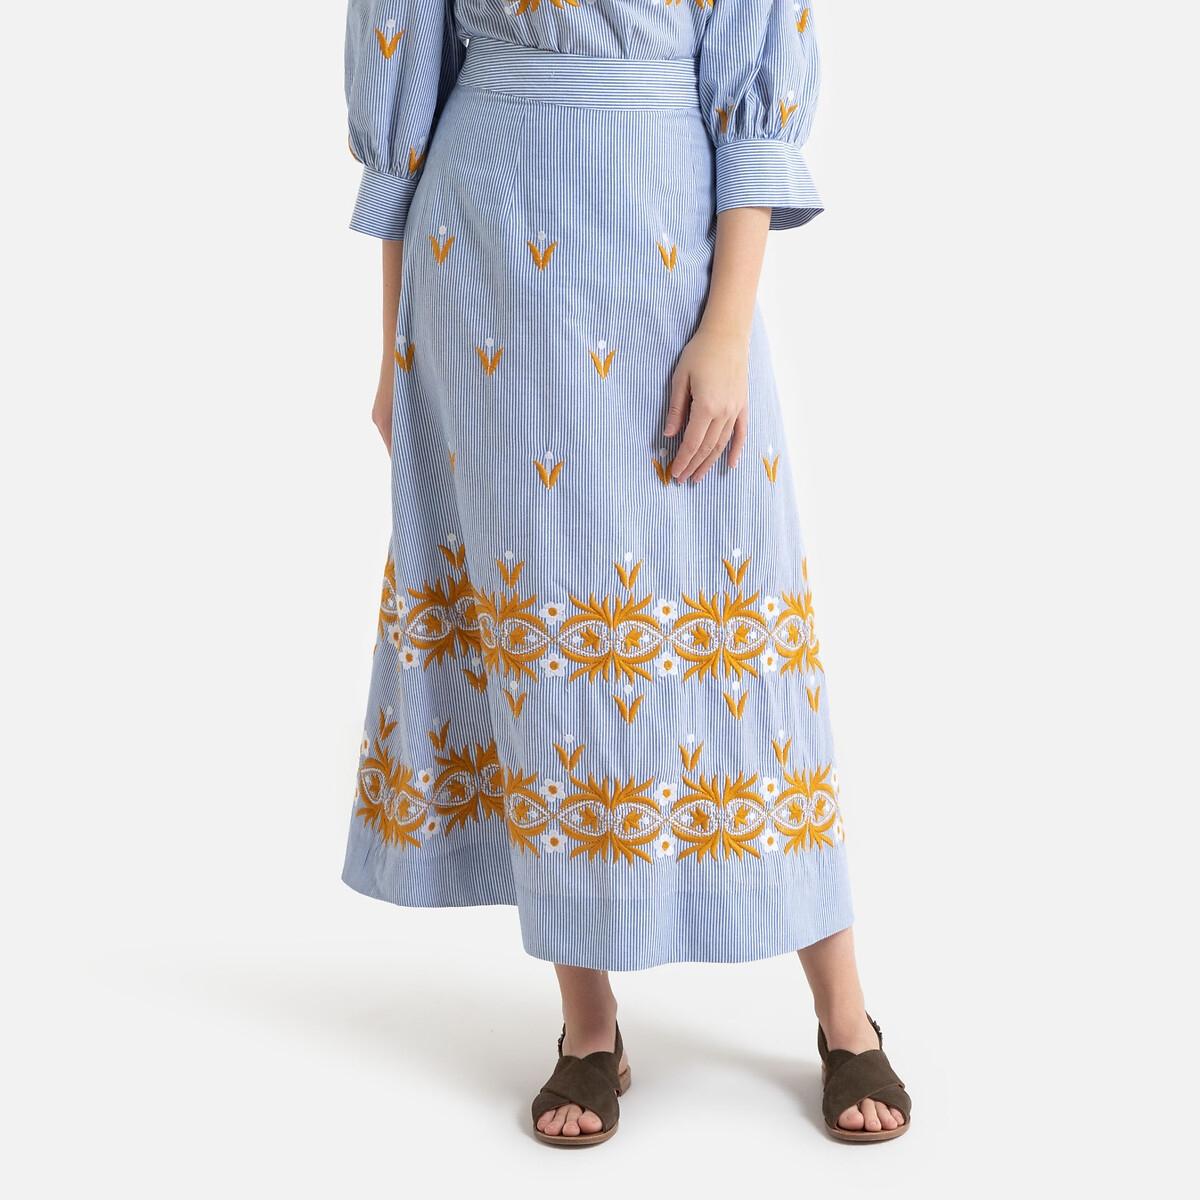 цена на Юбка-трапеция La Redoute хлопок в полоску с вышивкой MEXICA 36 (FR) - 42 (RUS) синий